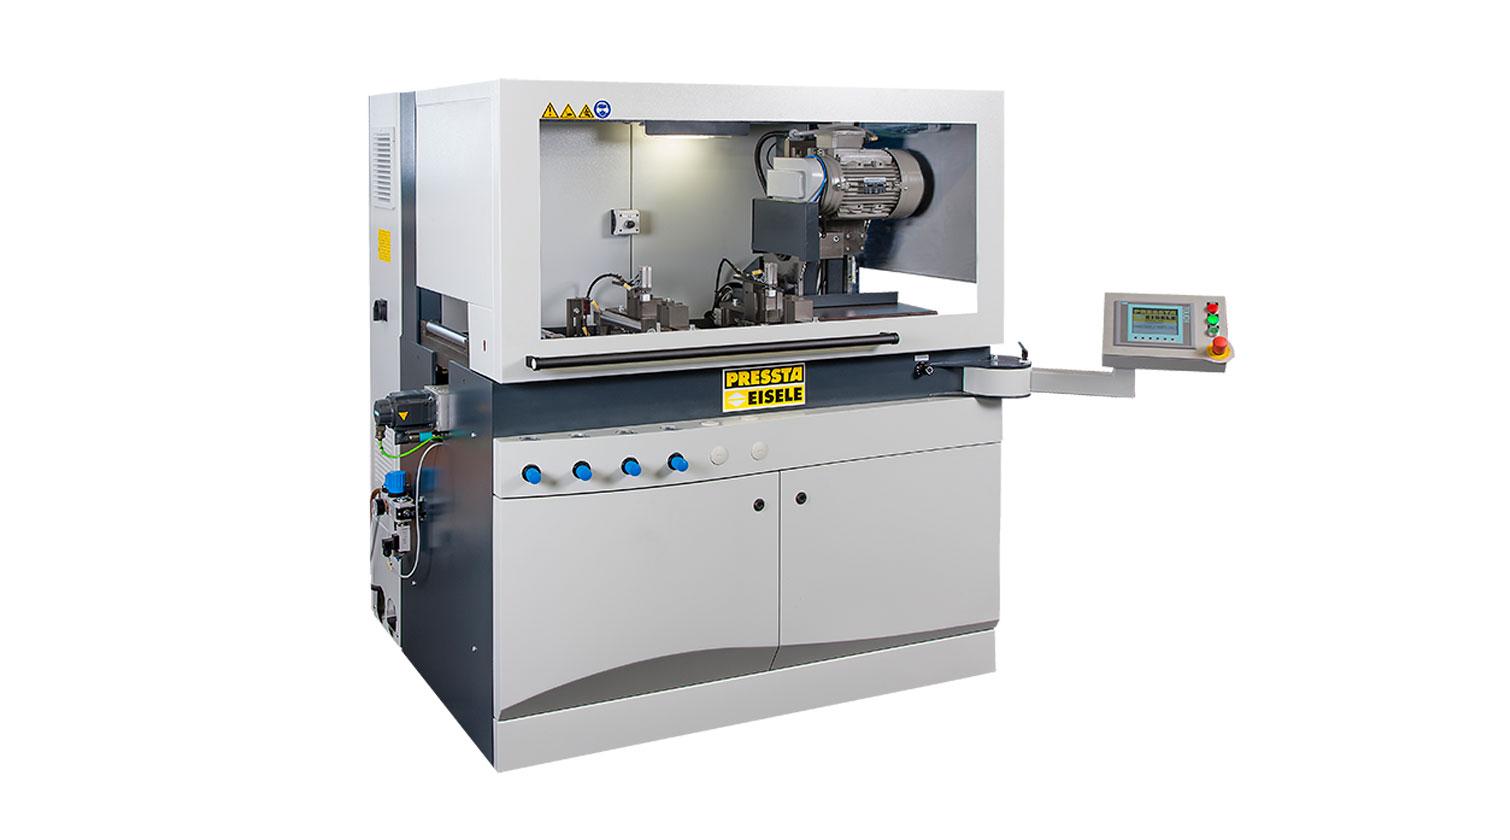 INT aluminum automatic saw Pressta Eisele Profilma 250 1